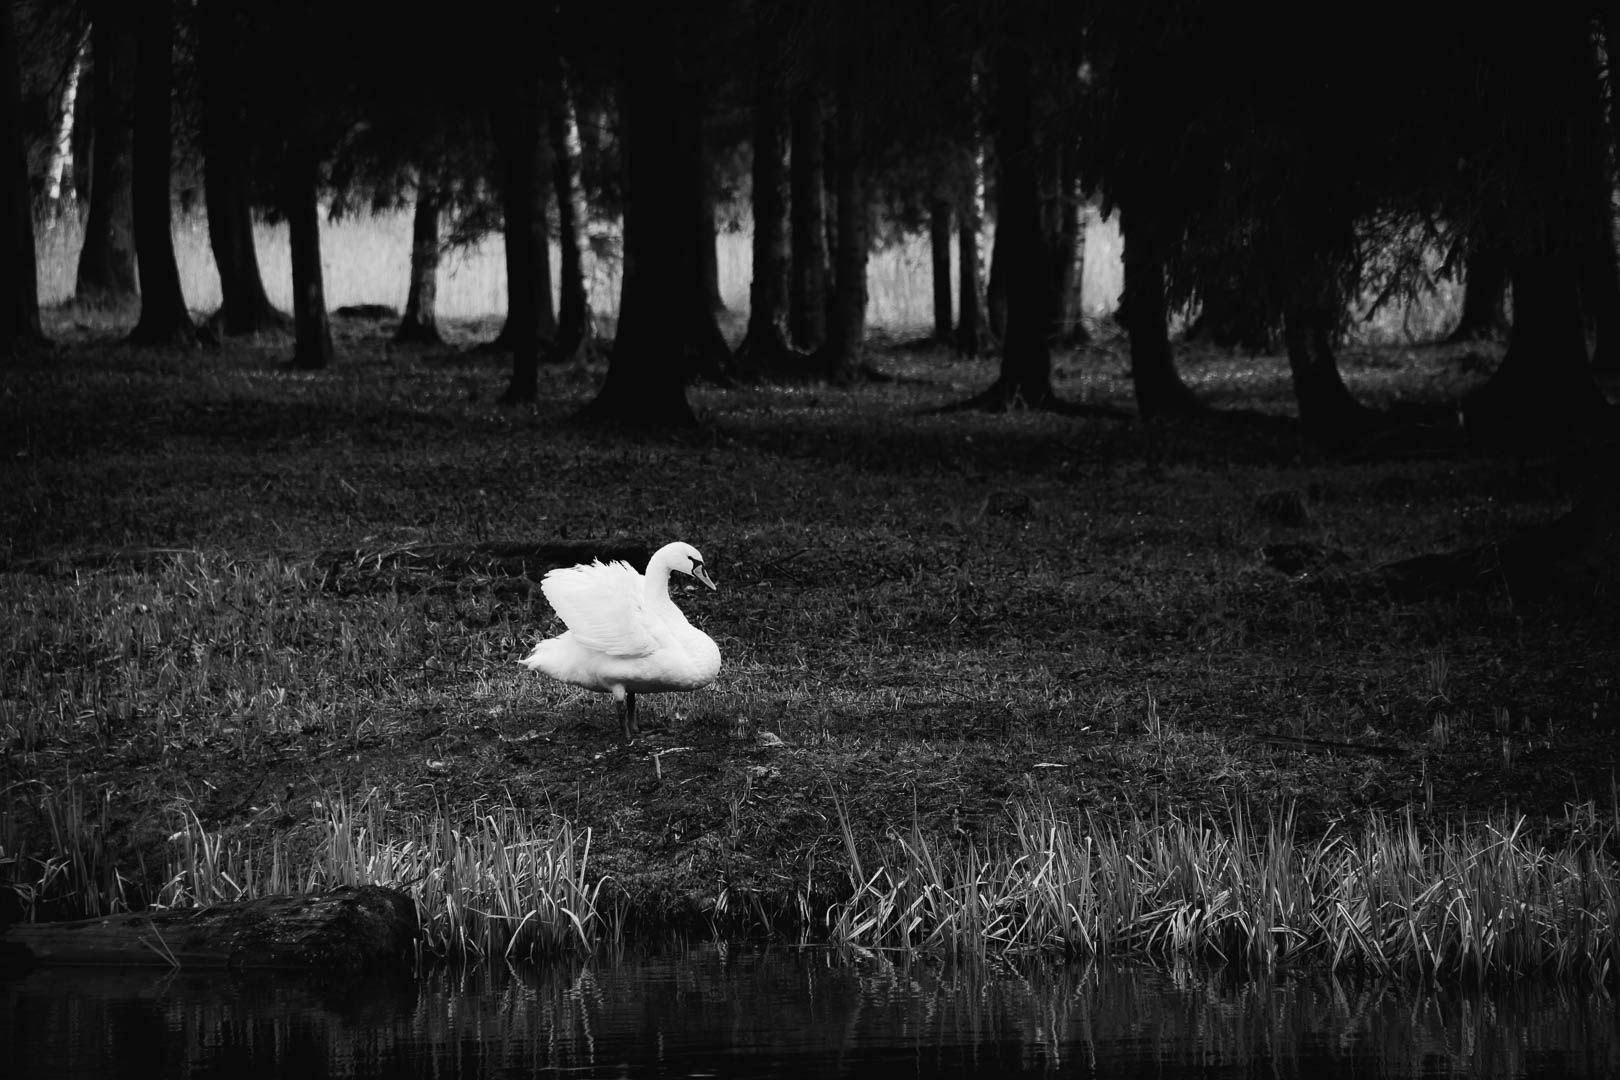 Пятнышко Зеркалка кэнон животные фото фотопрогулка чб черное и белое глубина bw canon animal fineart